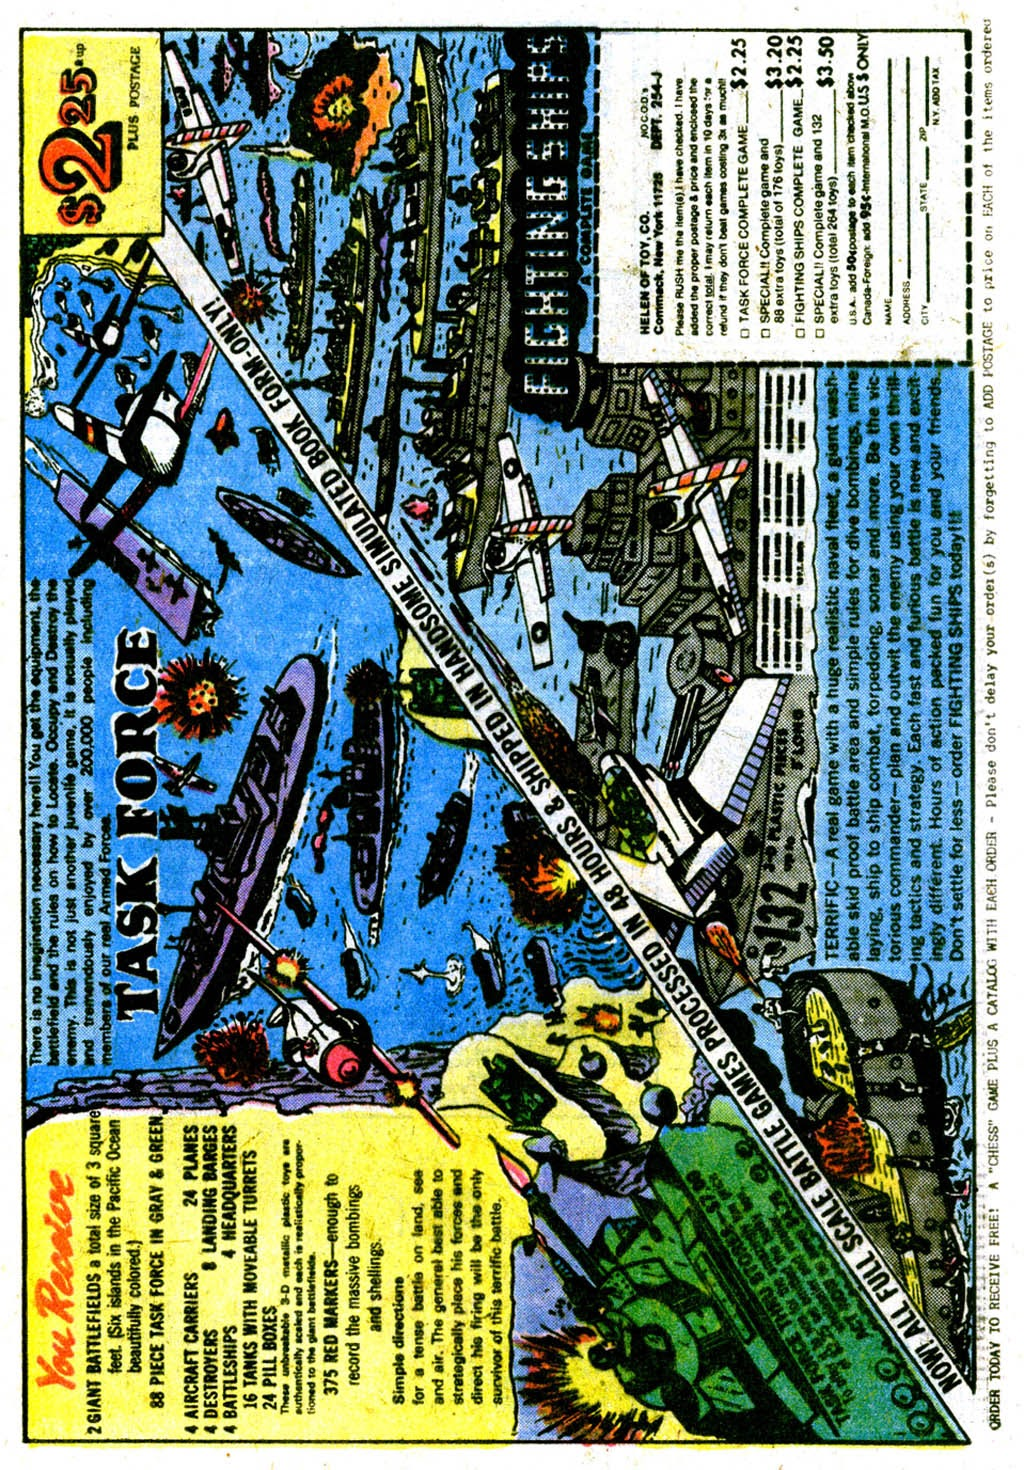 Read online Sgt. Rock comic -  Issue #332 - 28